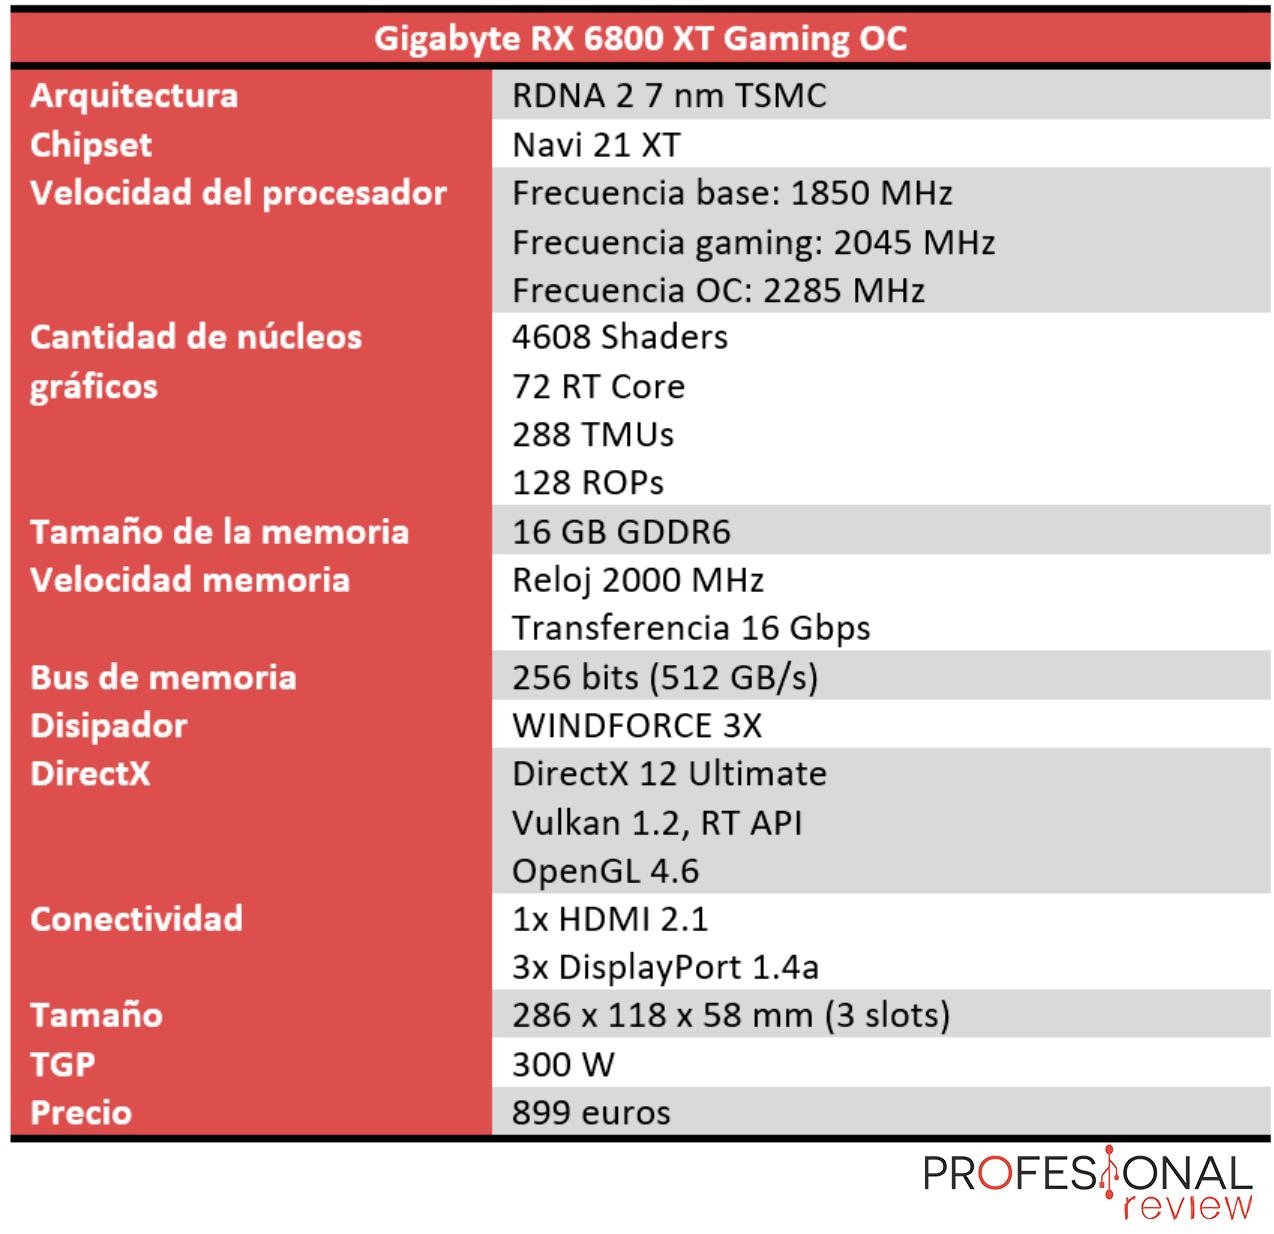 Gigabyte RX 6800 XT Gaming OC Características